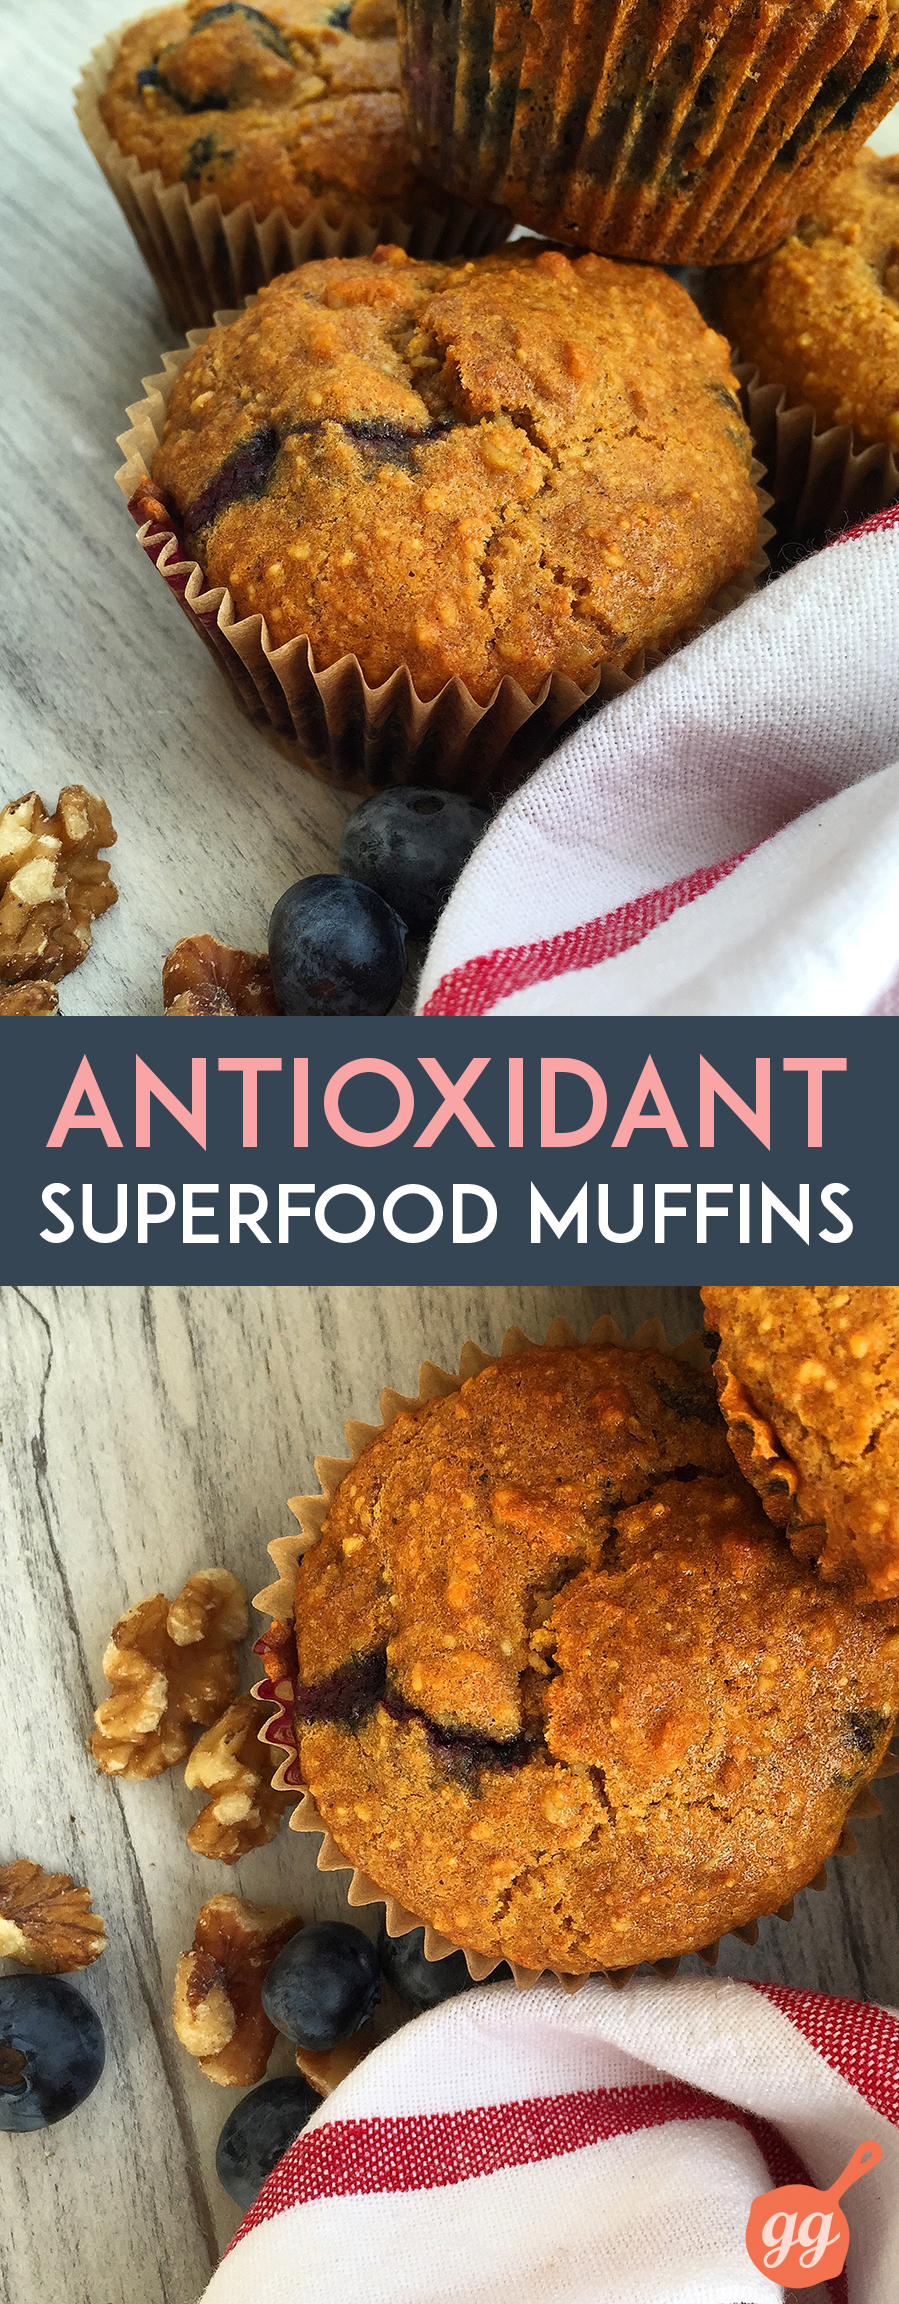 Antioxidant Superfood Muffins (grain free, dairy free, refined sugar free, paleo)   GrokGrub.com